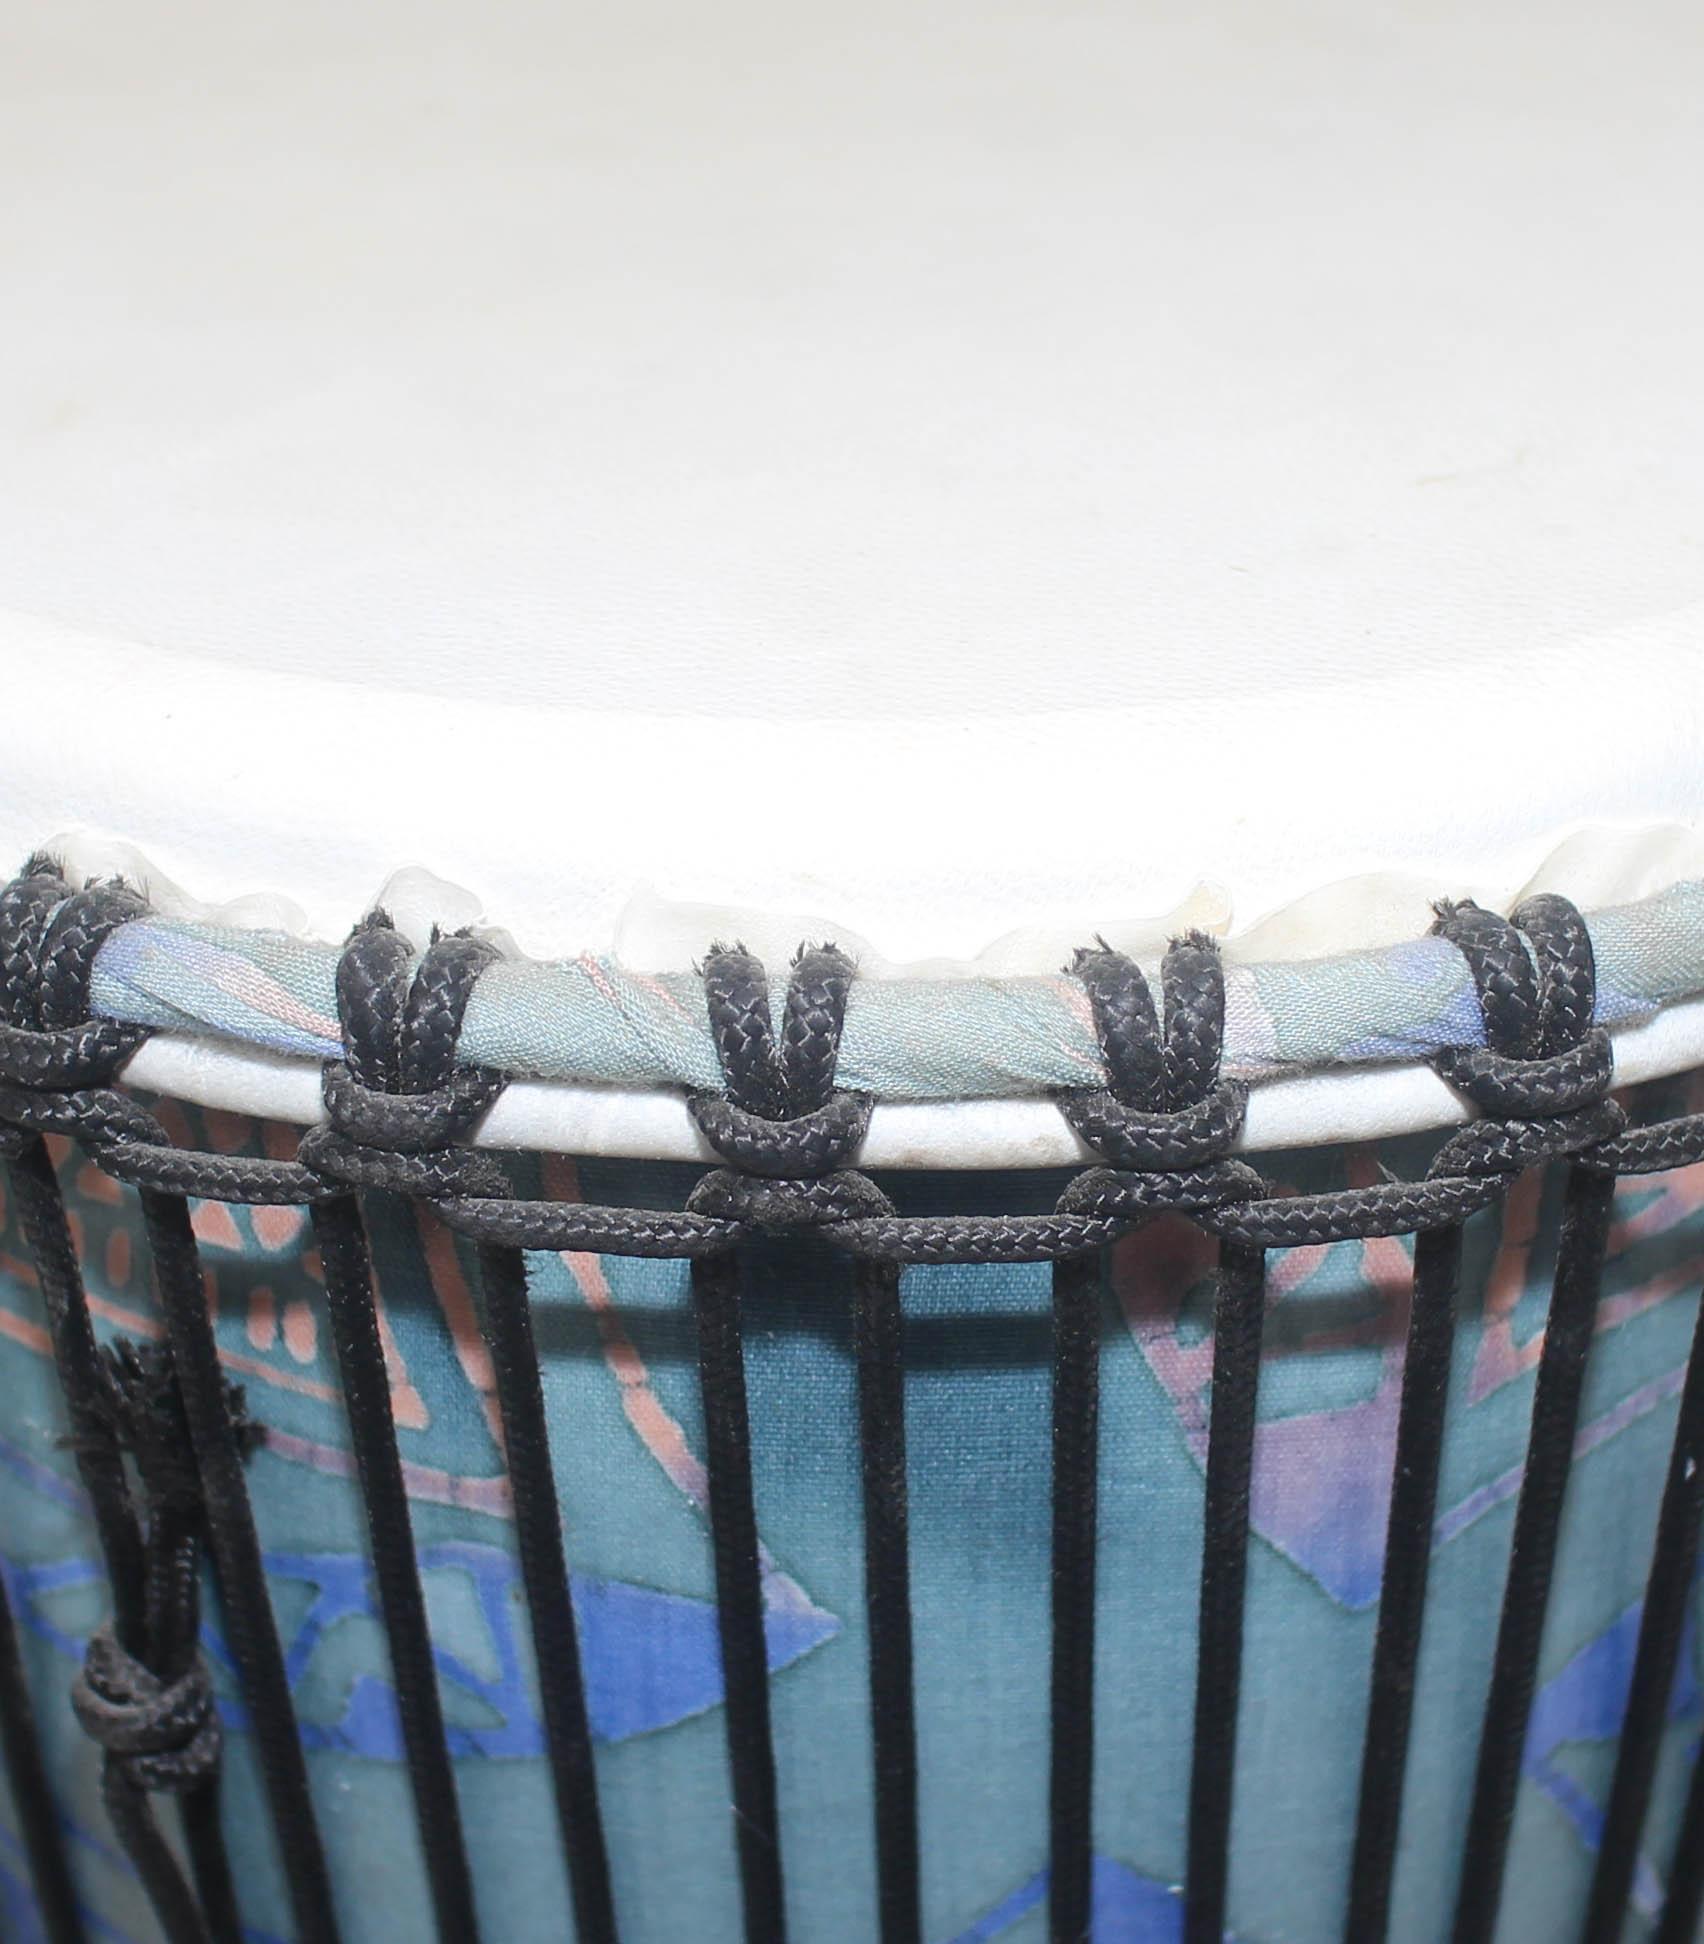 ESPVC-1A hand drum